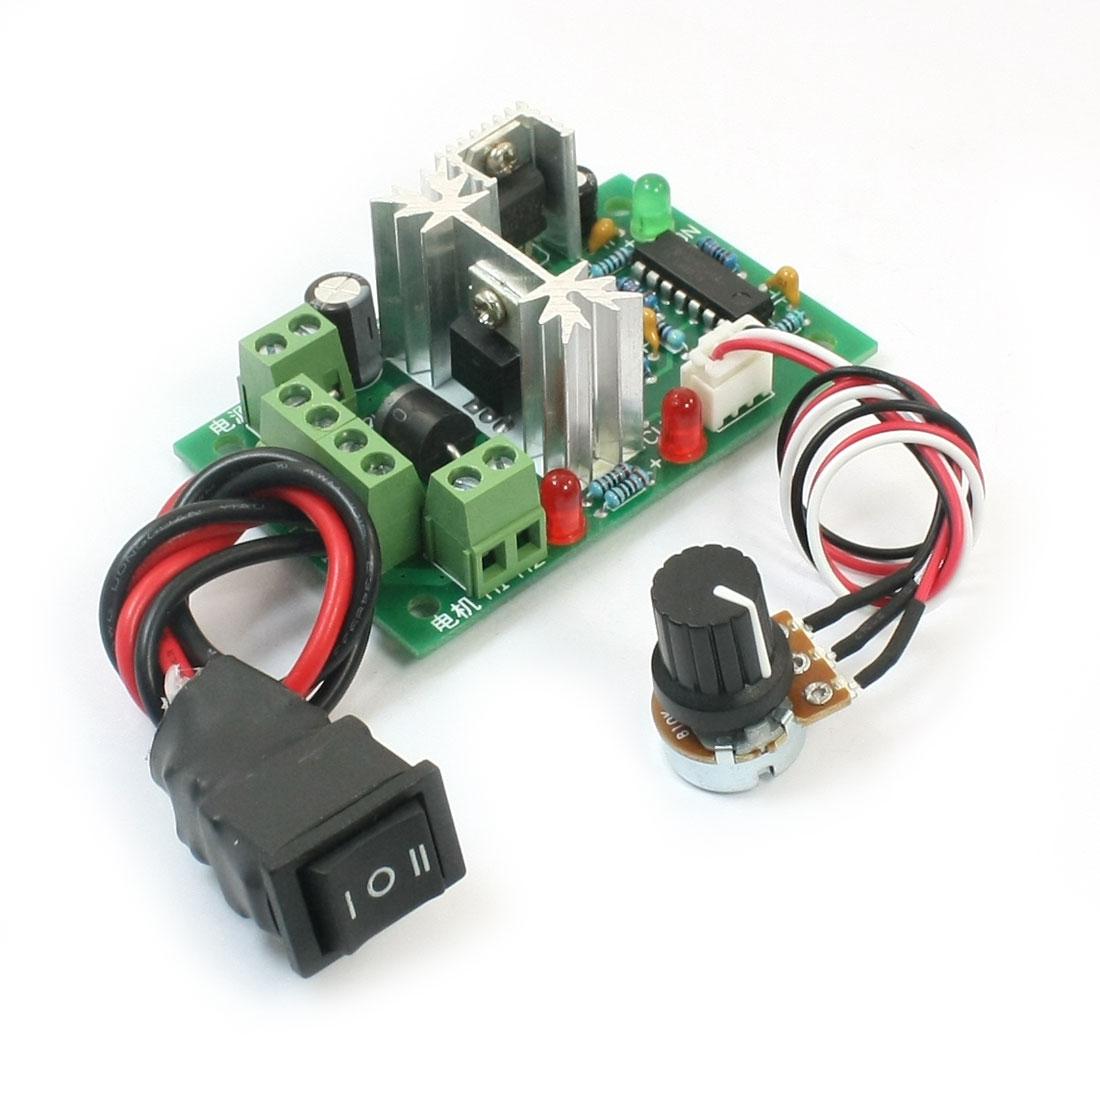 DC10-30V 120W Max PWM Motor Speed Controller w Reversing Switch CCM2U6